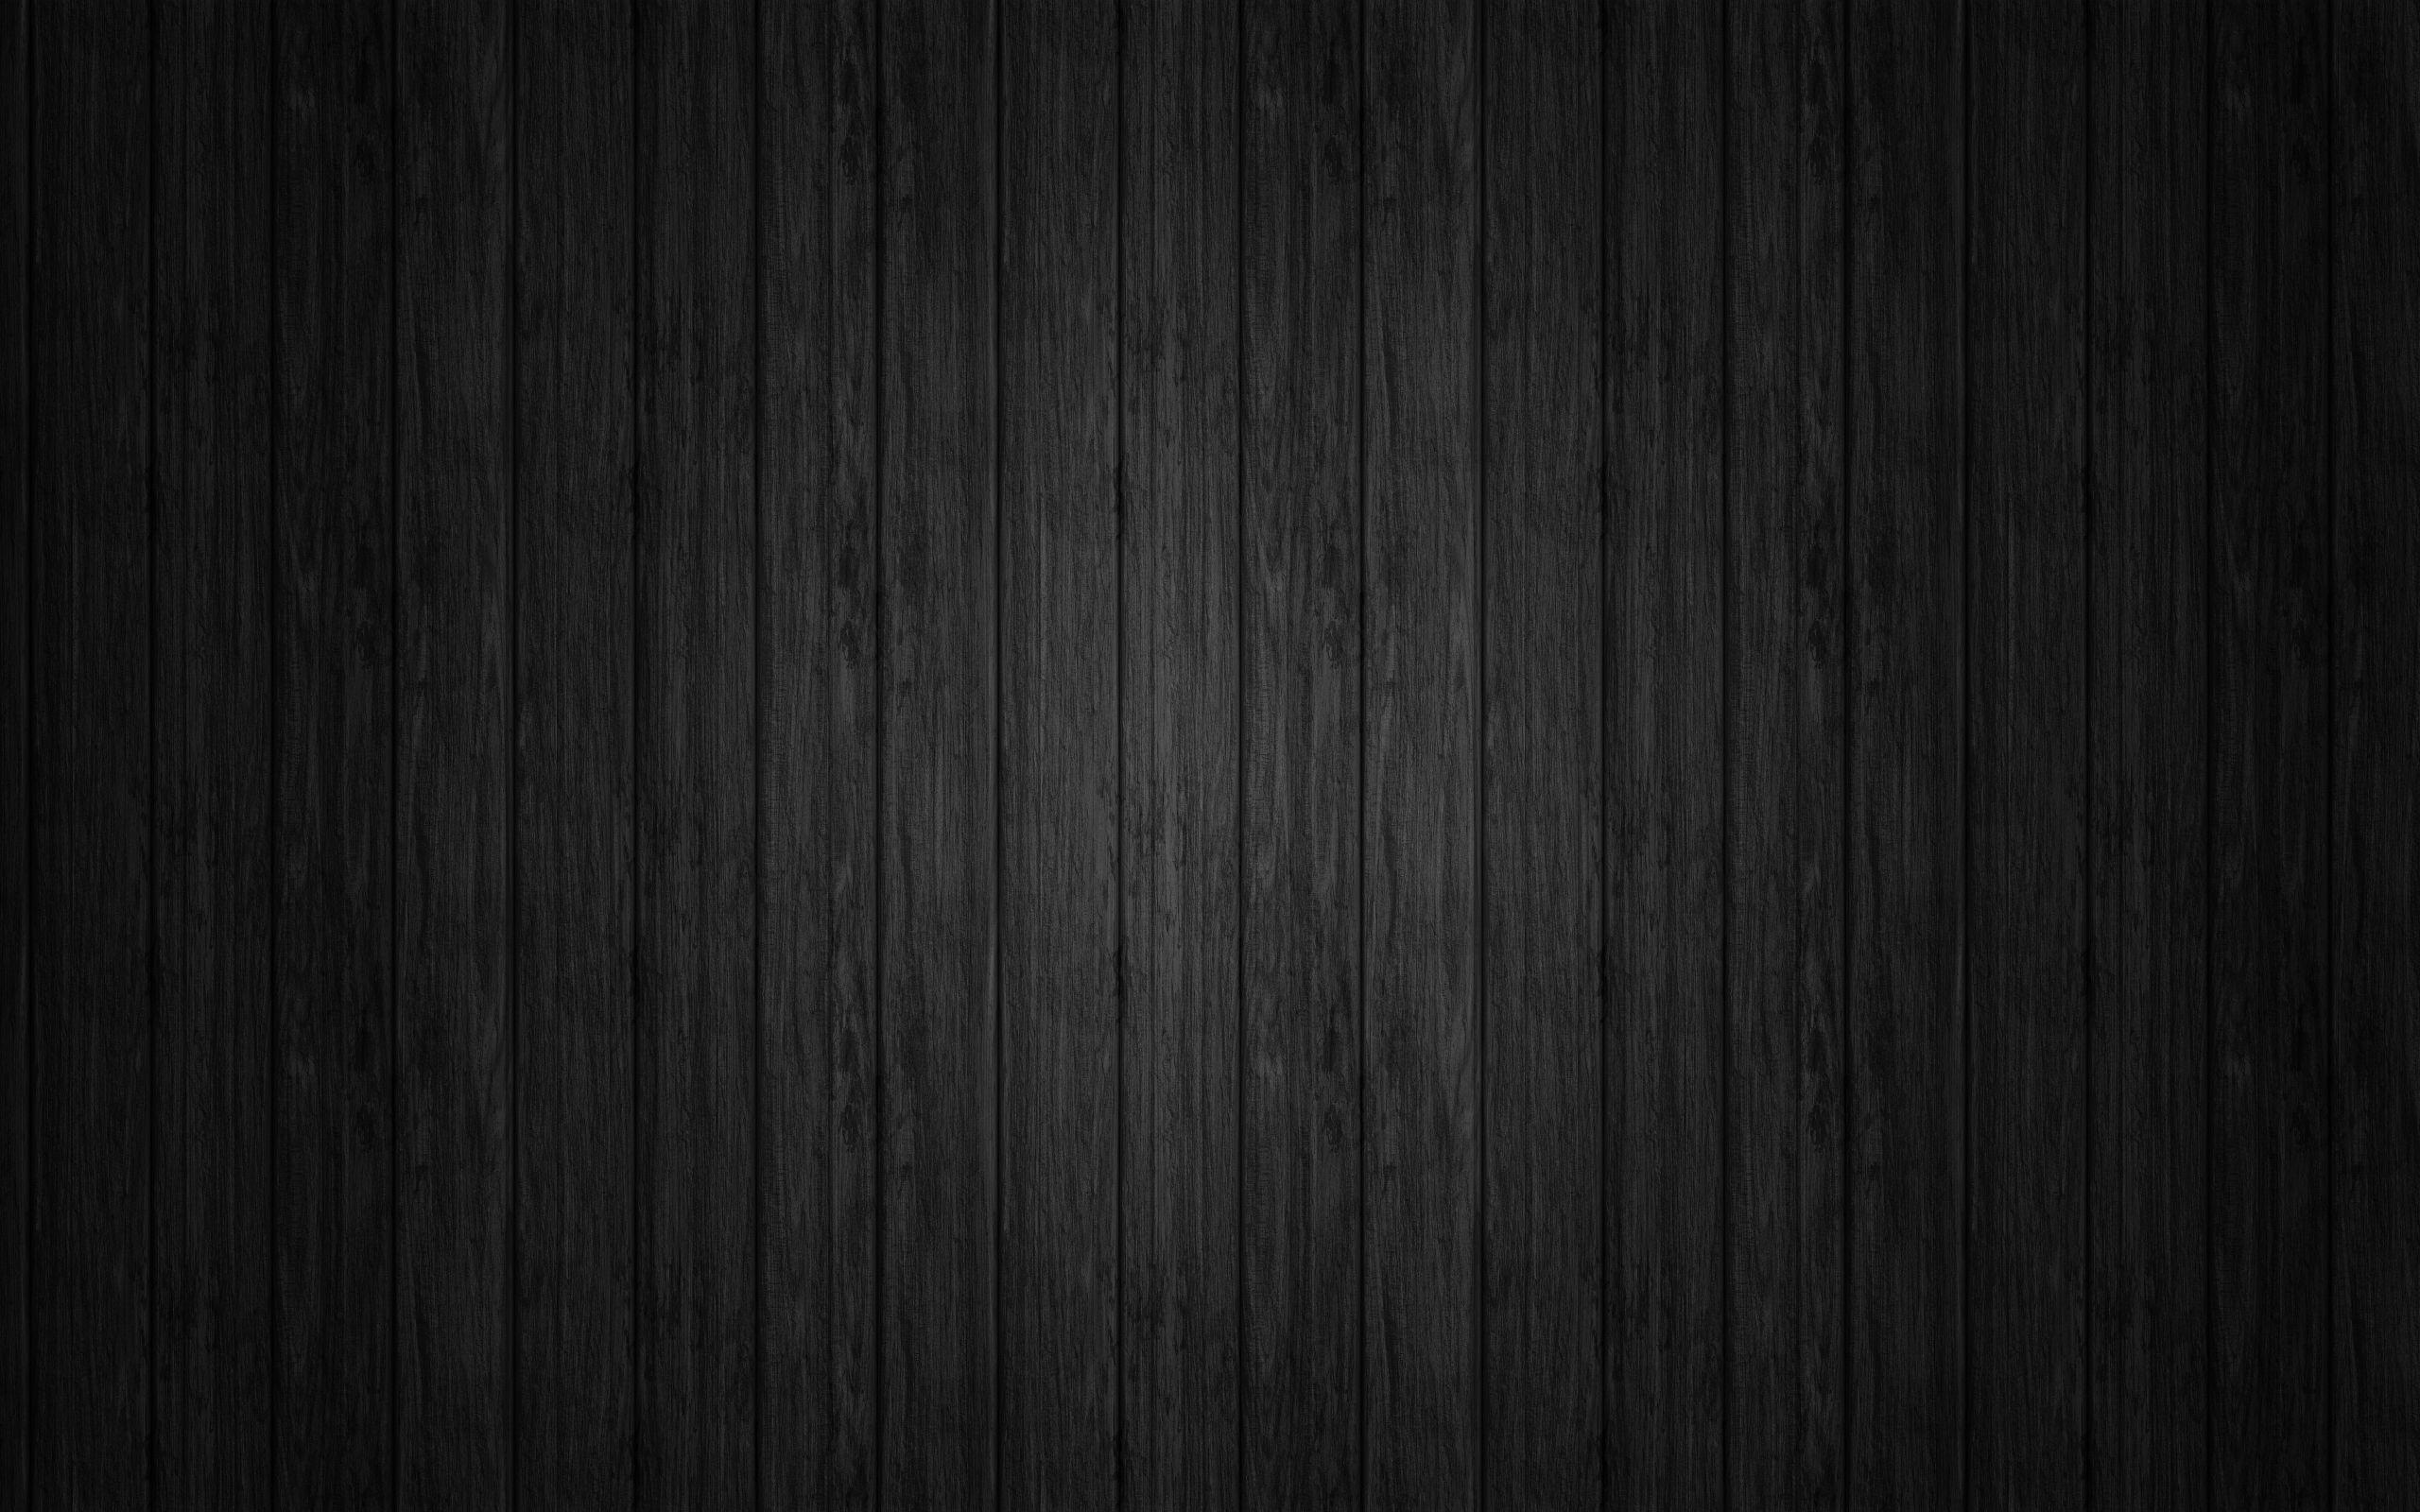 Madera negra | Wallpapers | Pinterest | Madera y Negro